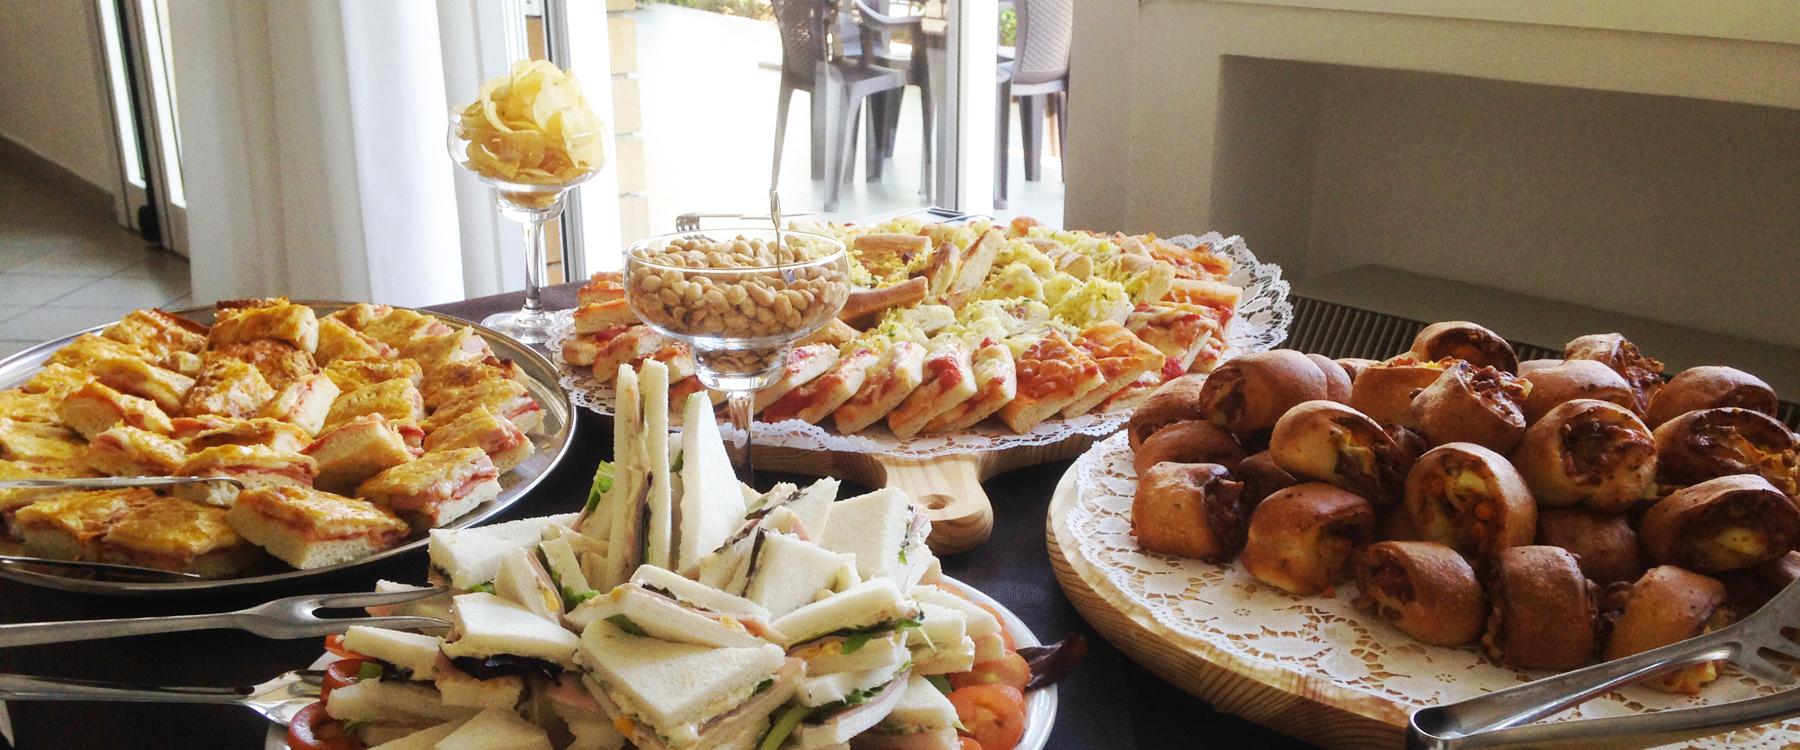 buffet-hotel-primula